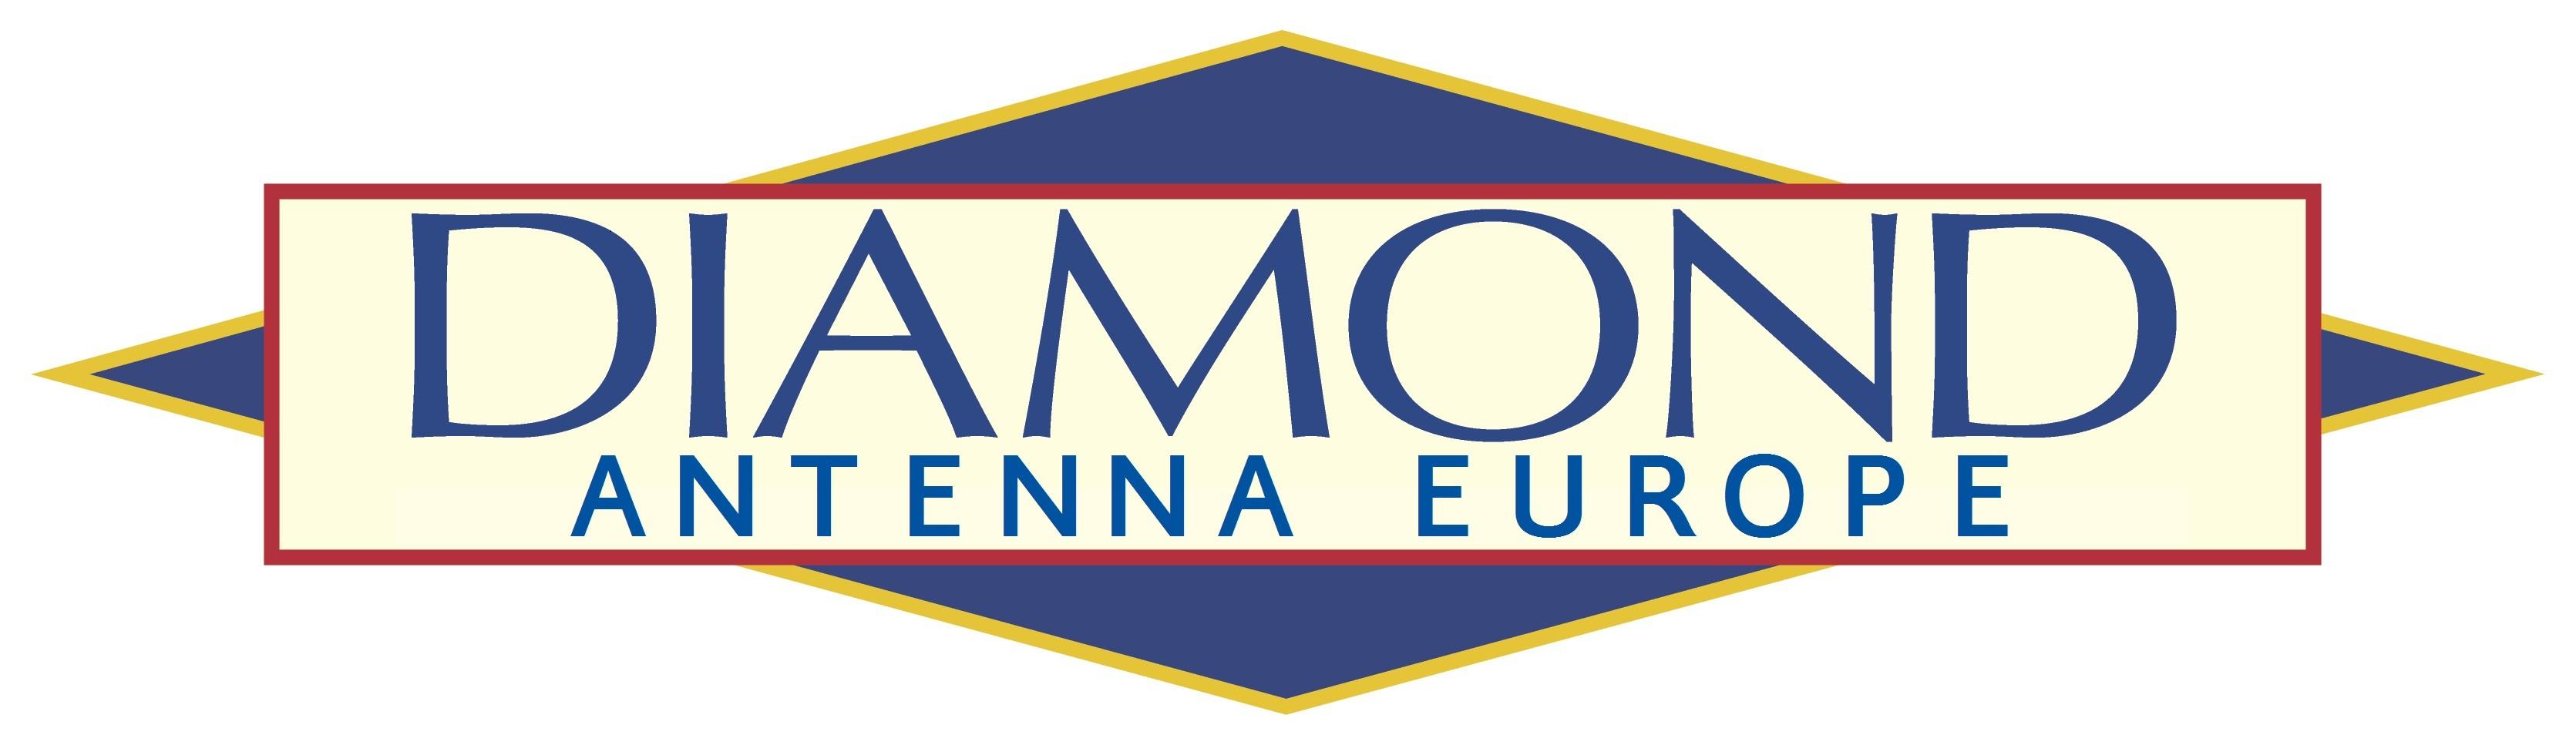 Diamond Antenna Europe | LinkedIn